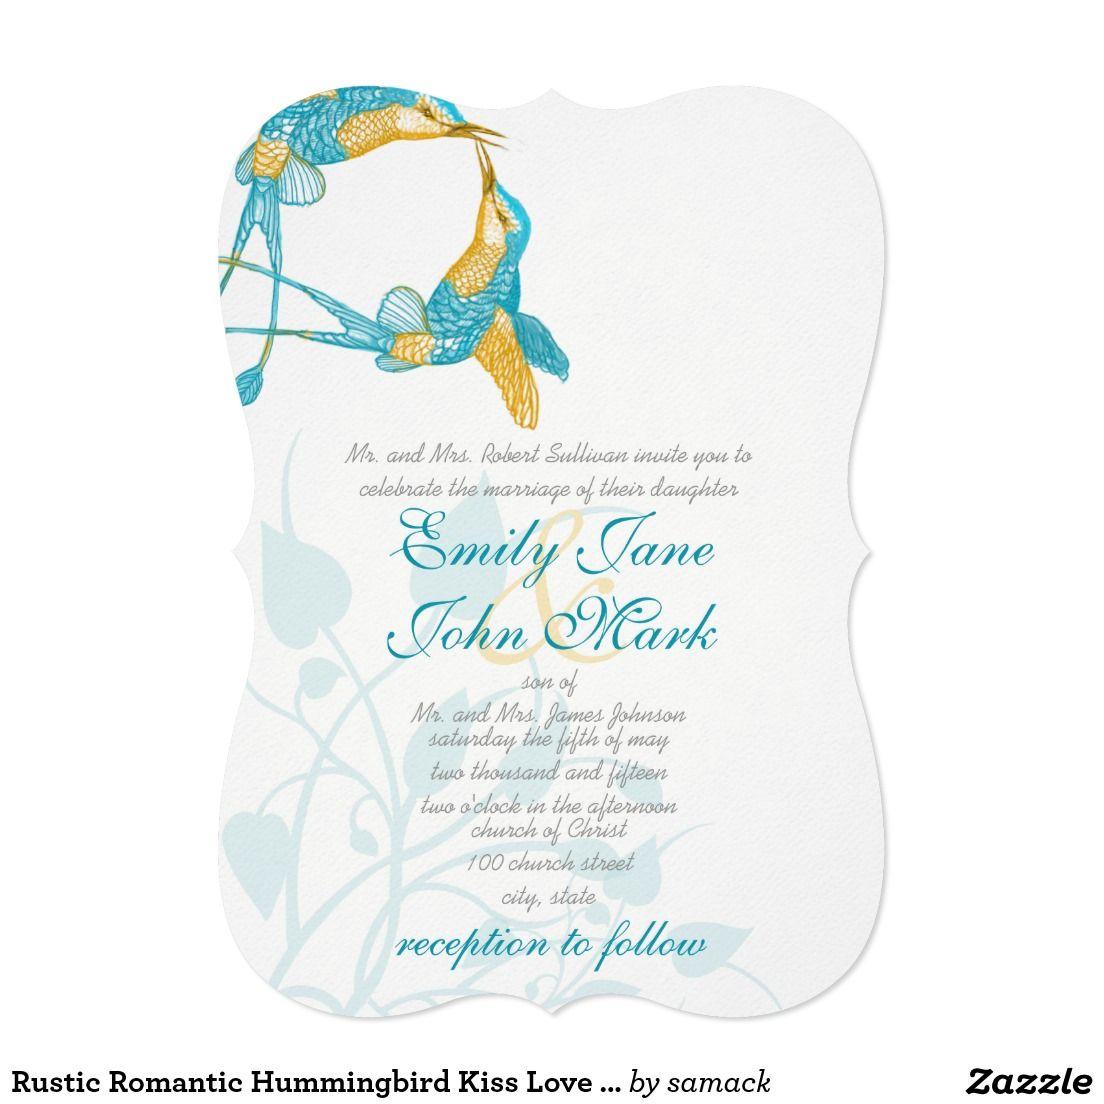 Rustic Romantic Hummingbird Kiss Love Bird Wedding Card ...